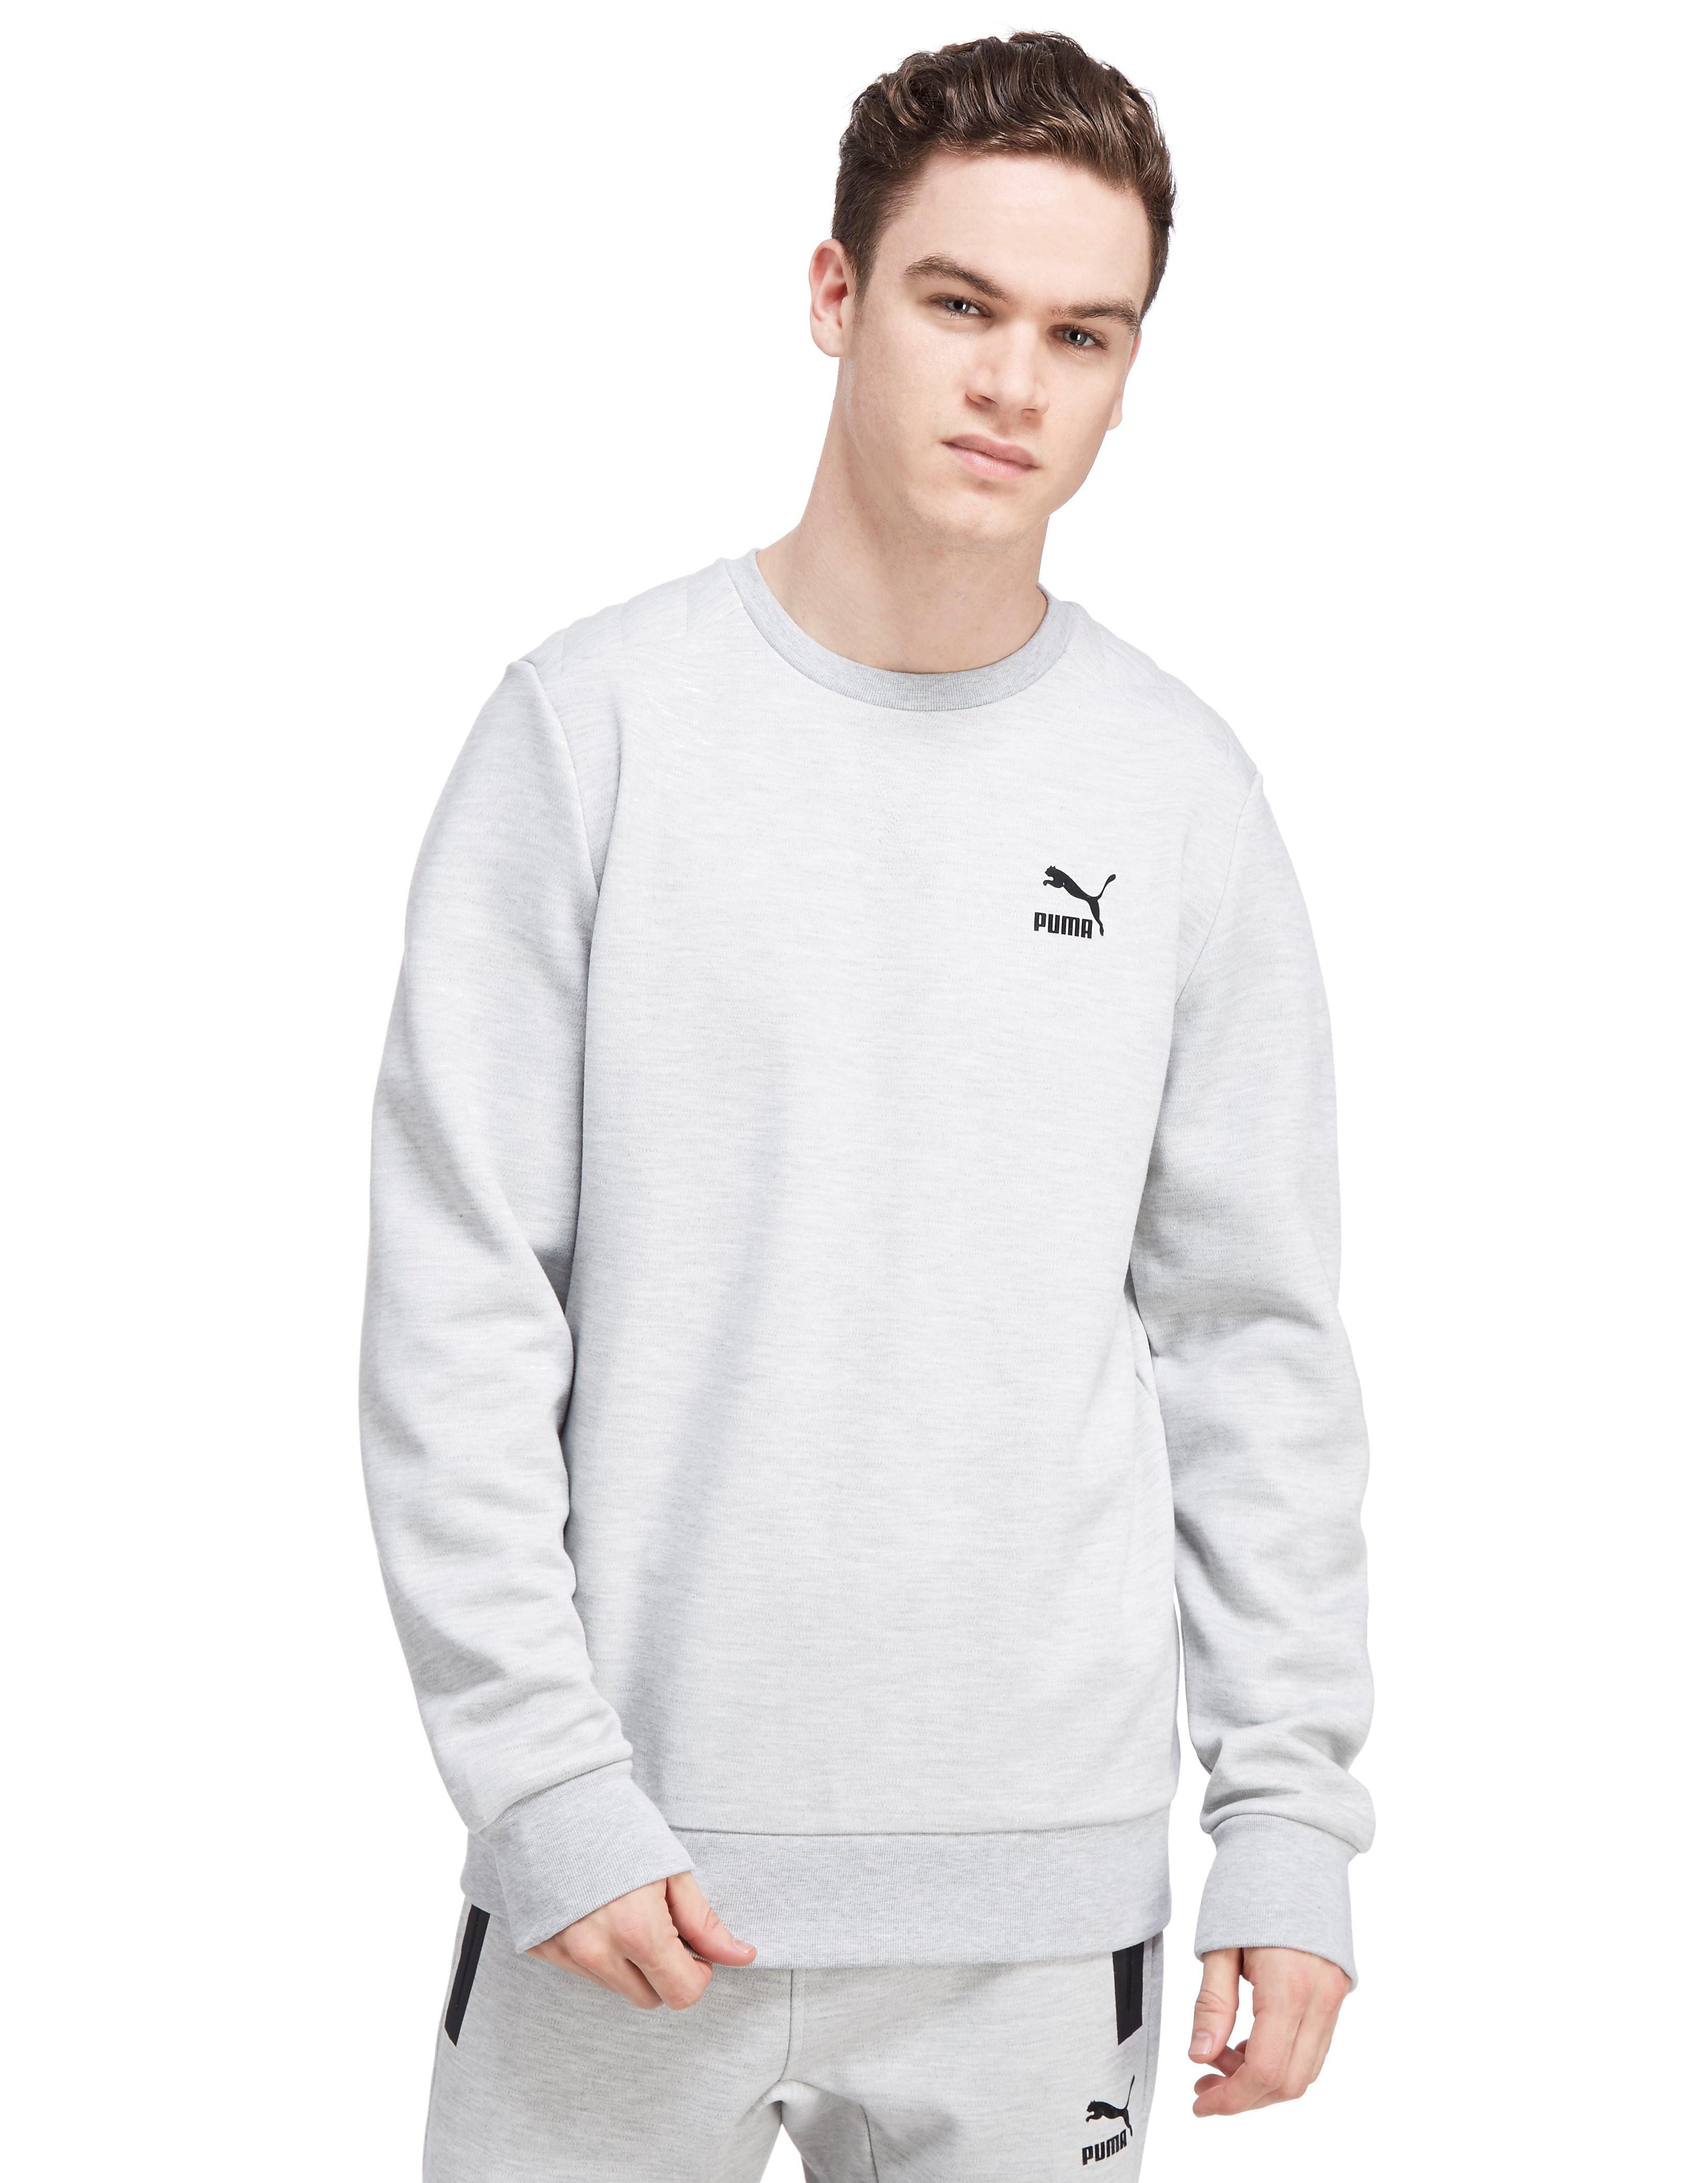 PUMA Evo Quilt Crew Sweatshirt